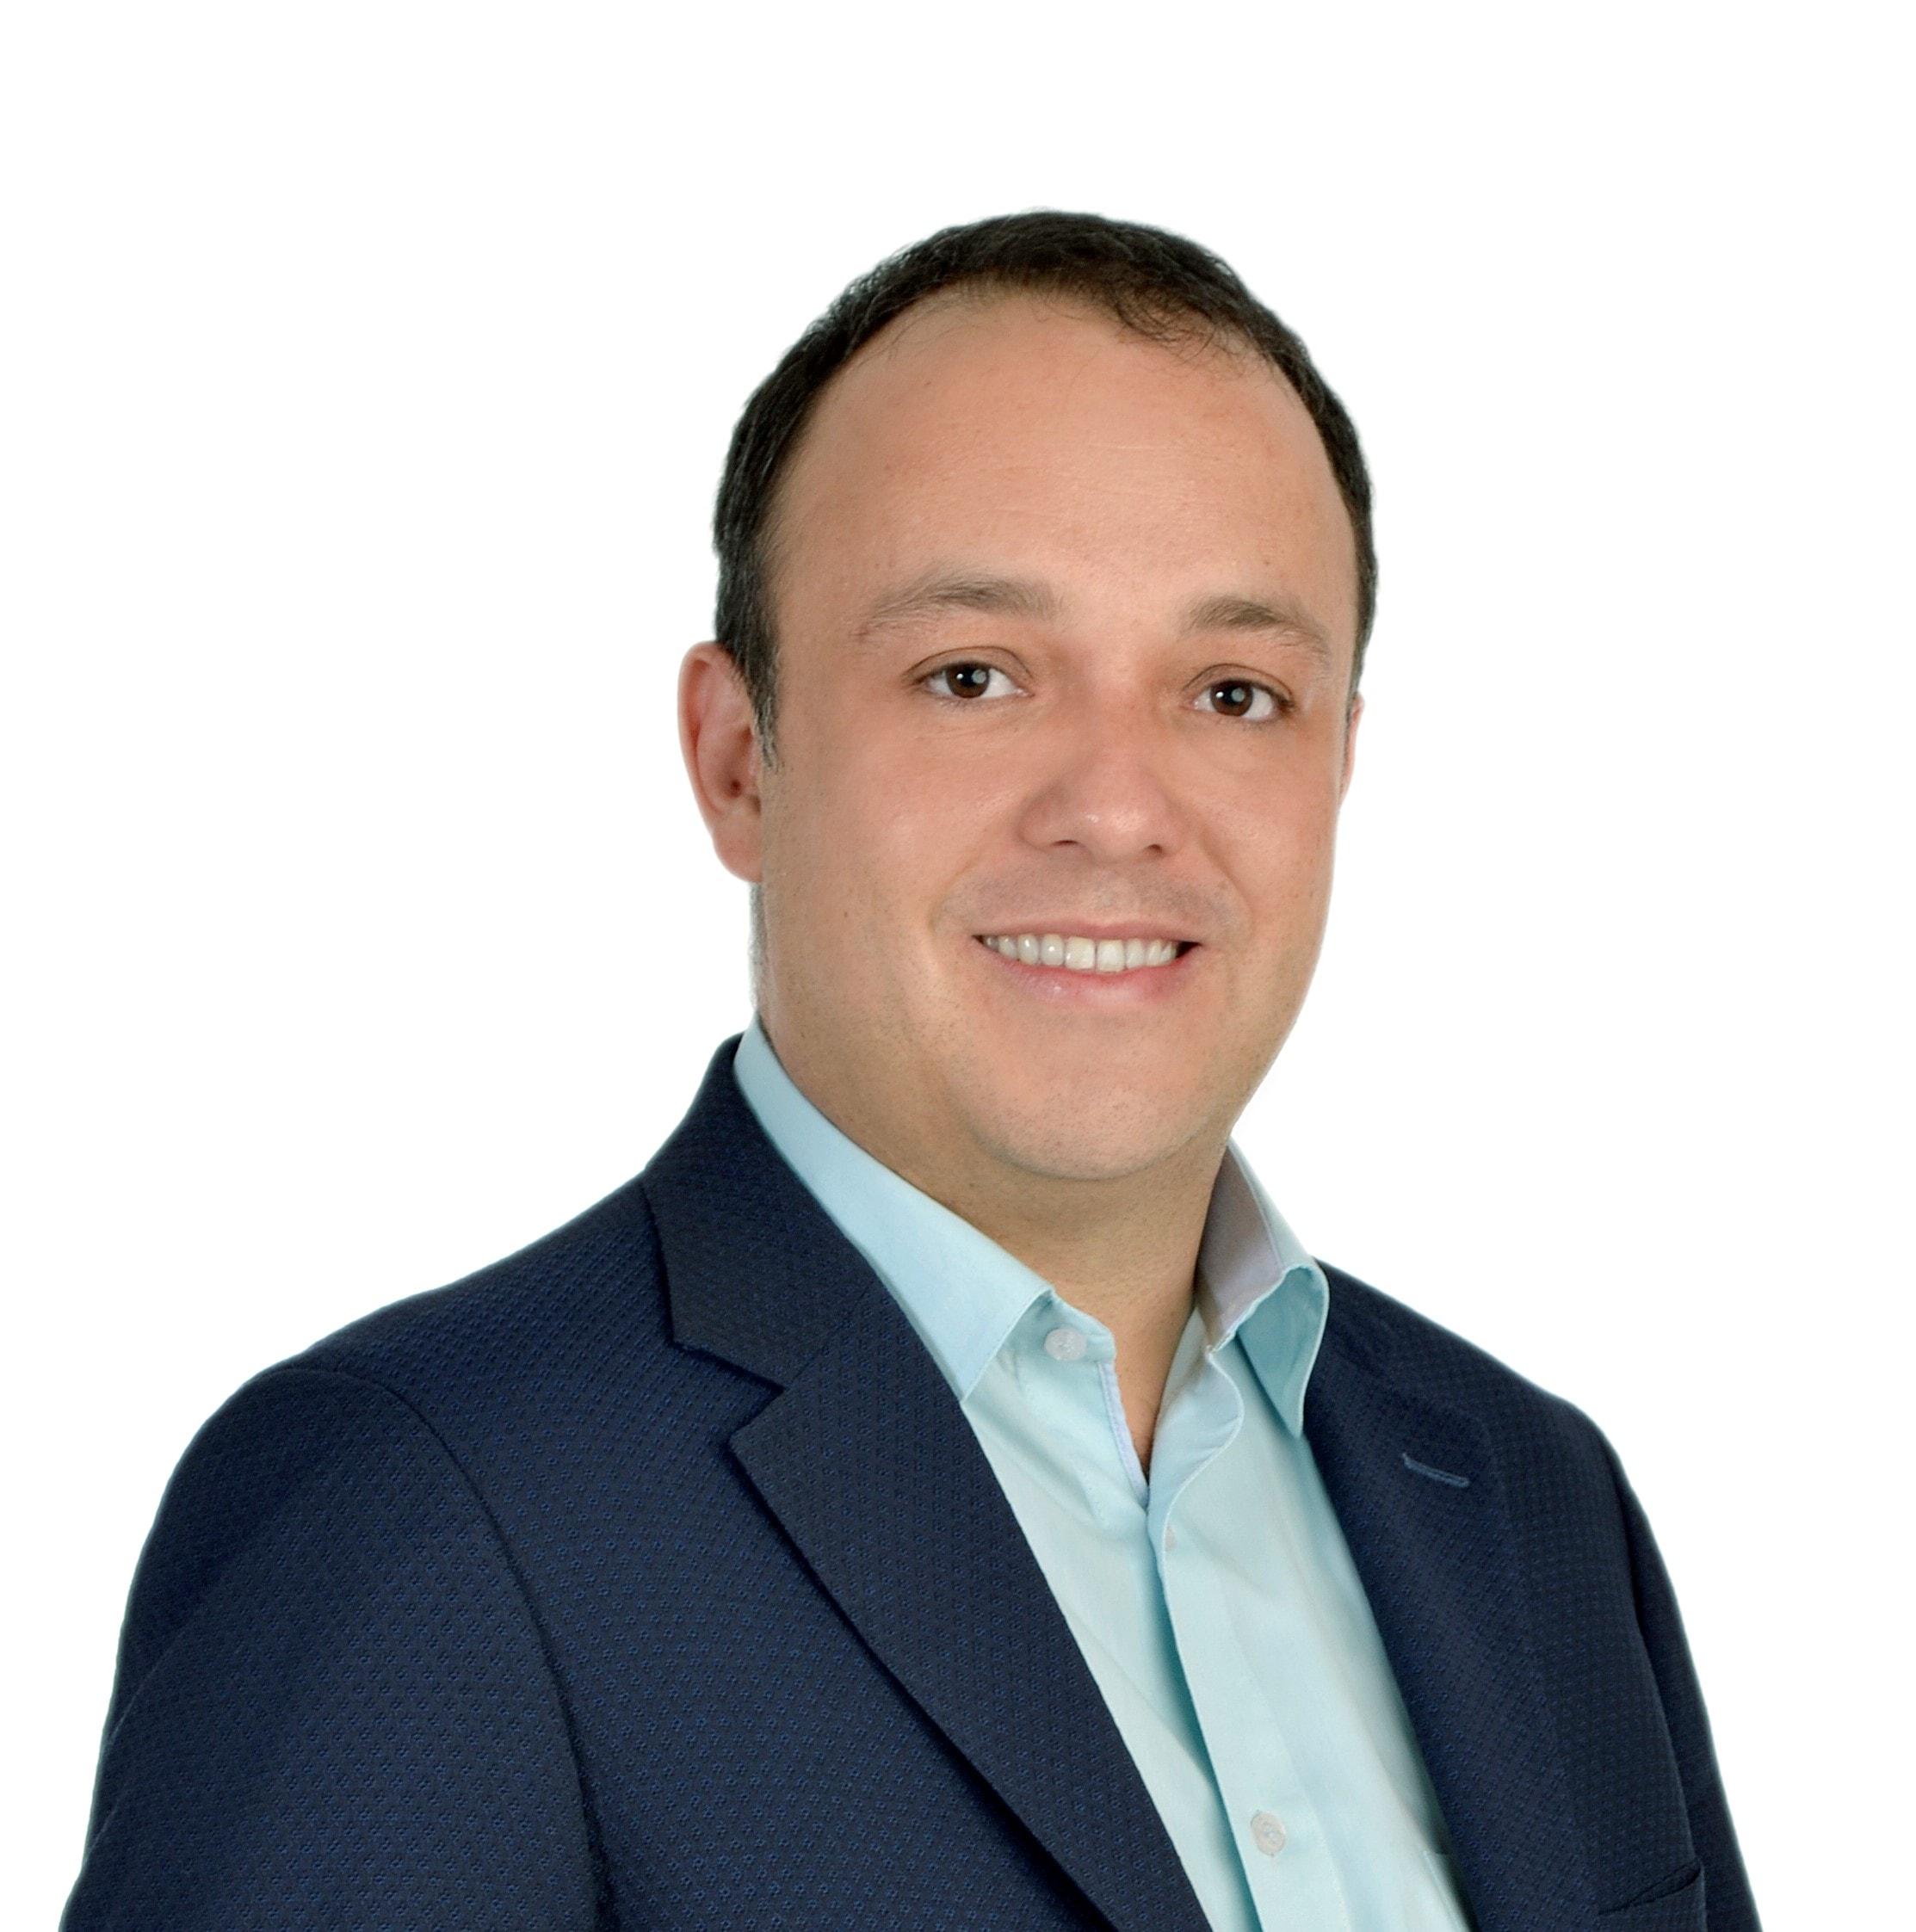 Mauricio Giraldo